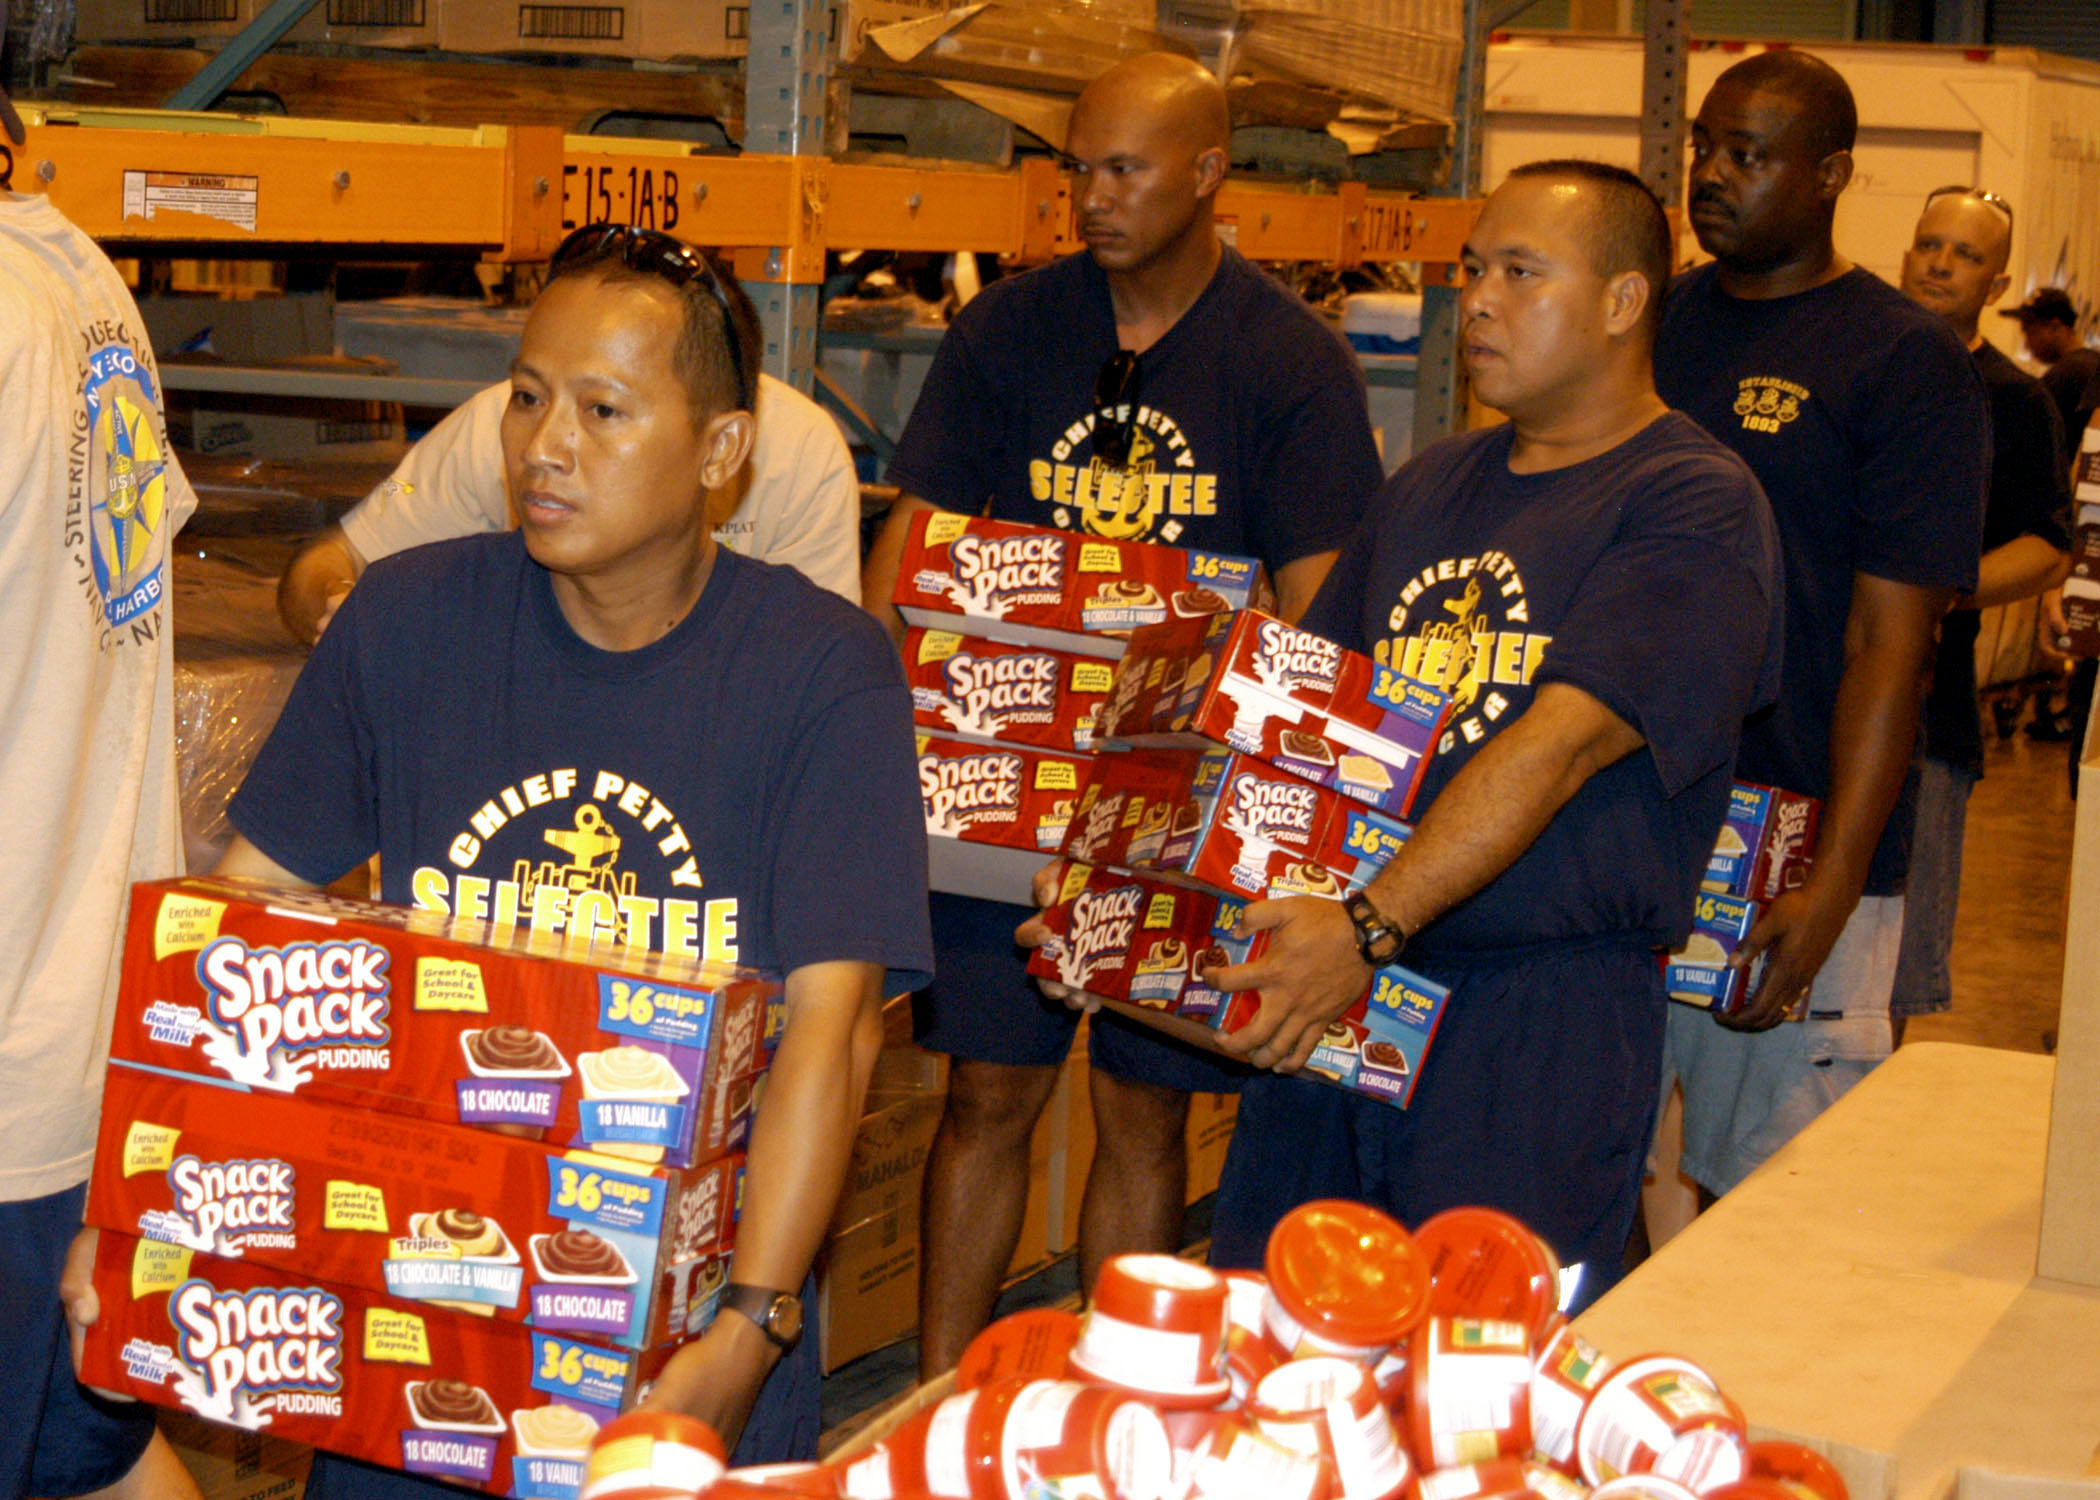 Chiefs_volunteer_at_food_bank_DVIDS202565.jpg?profile=RESIZE_710x